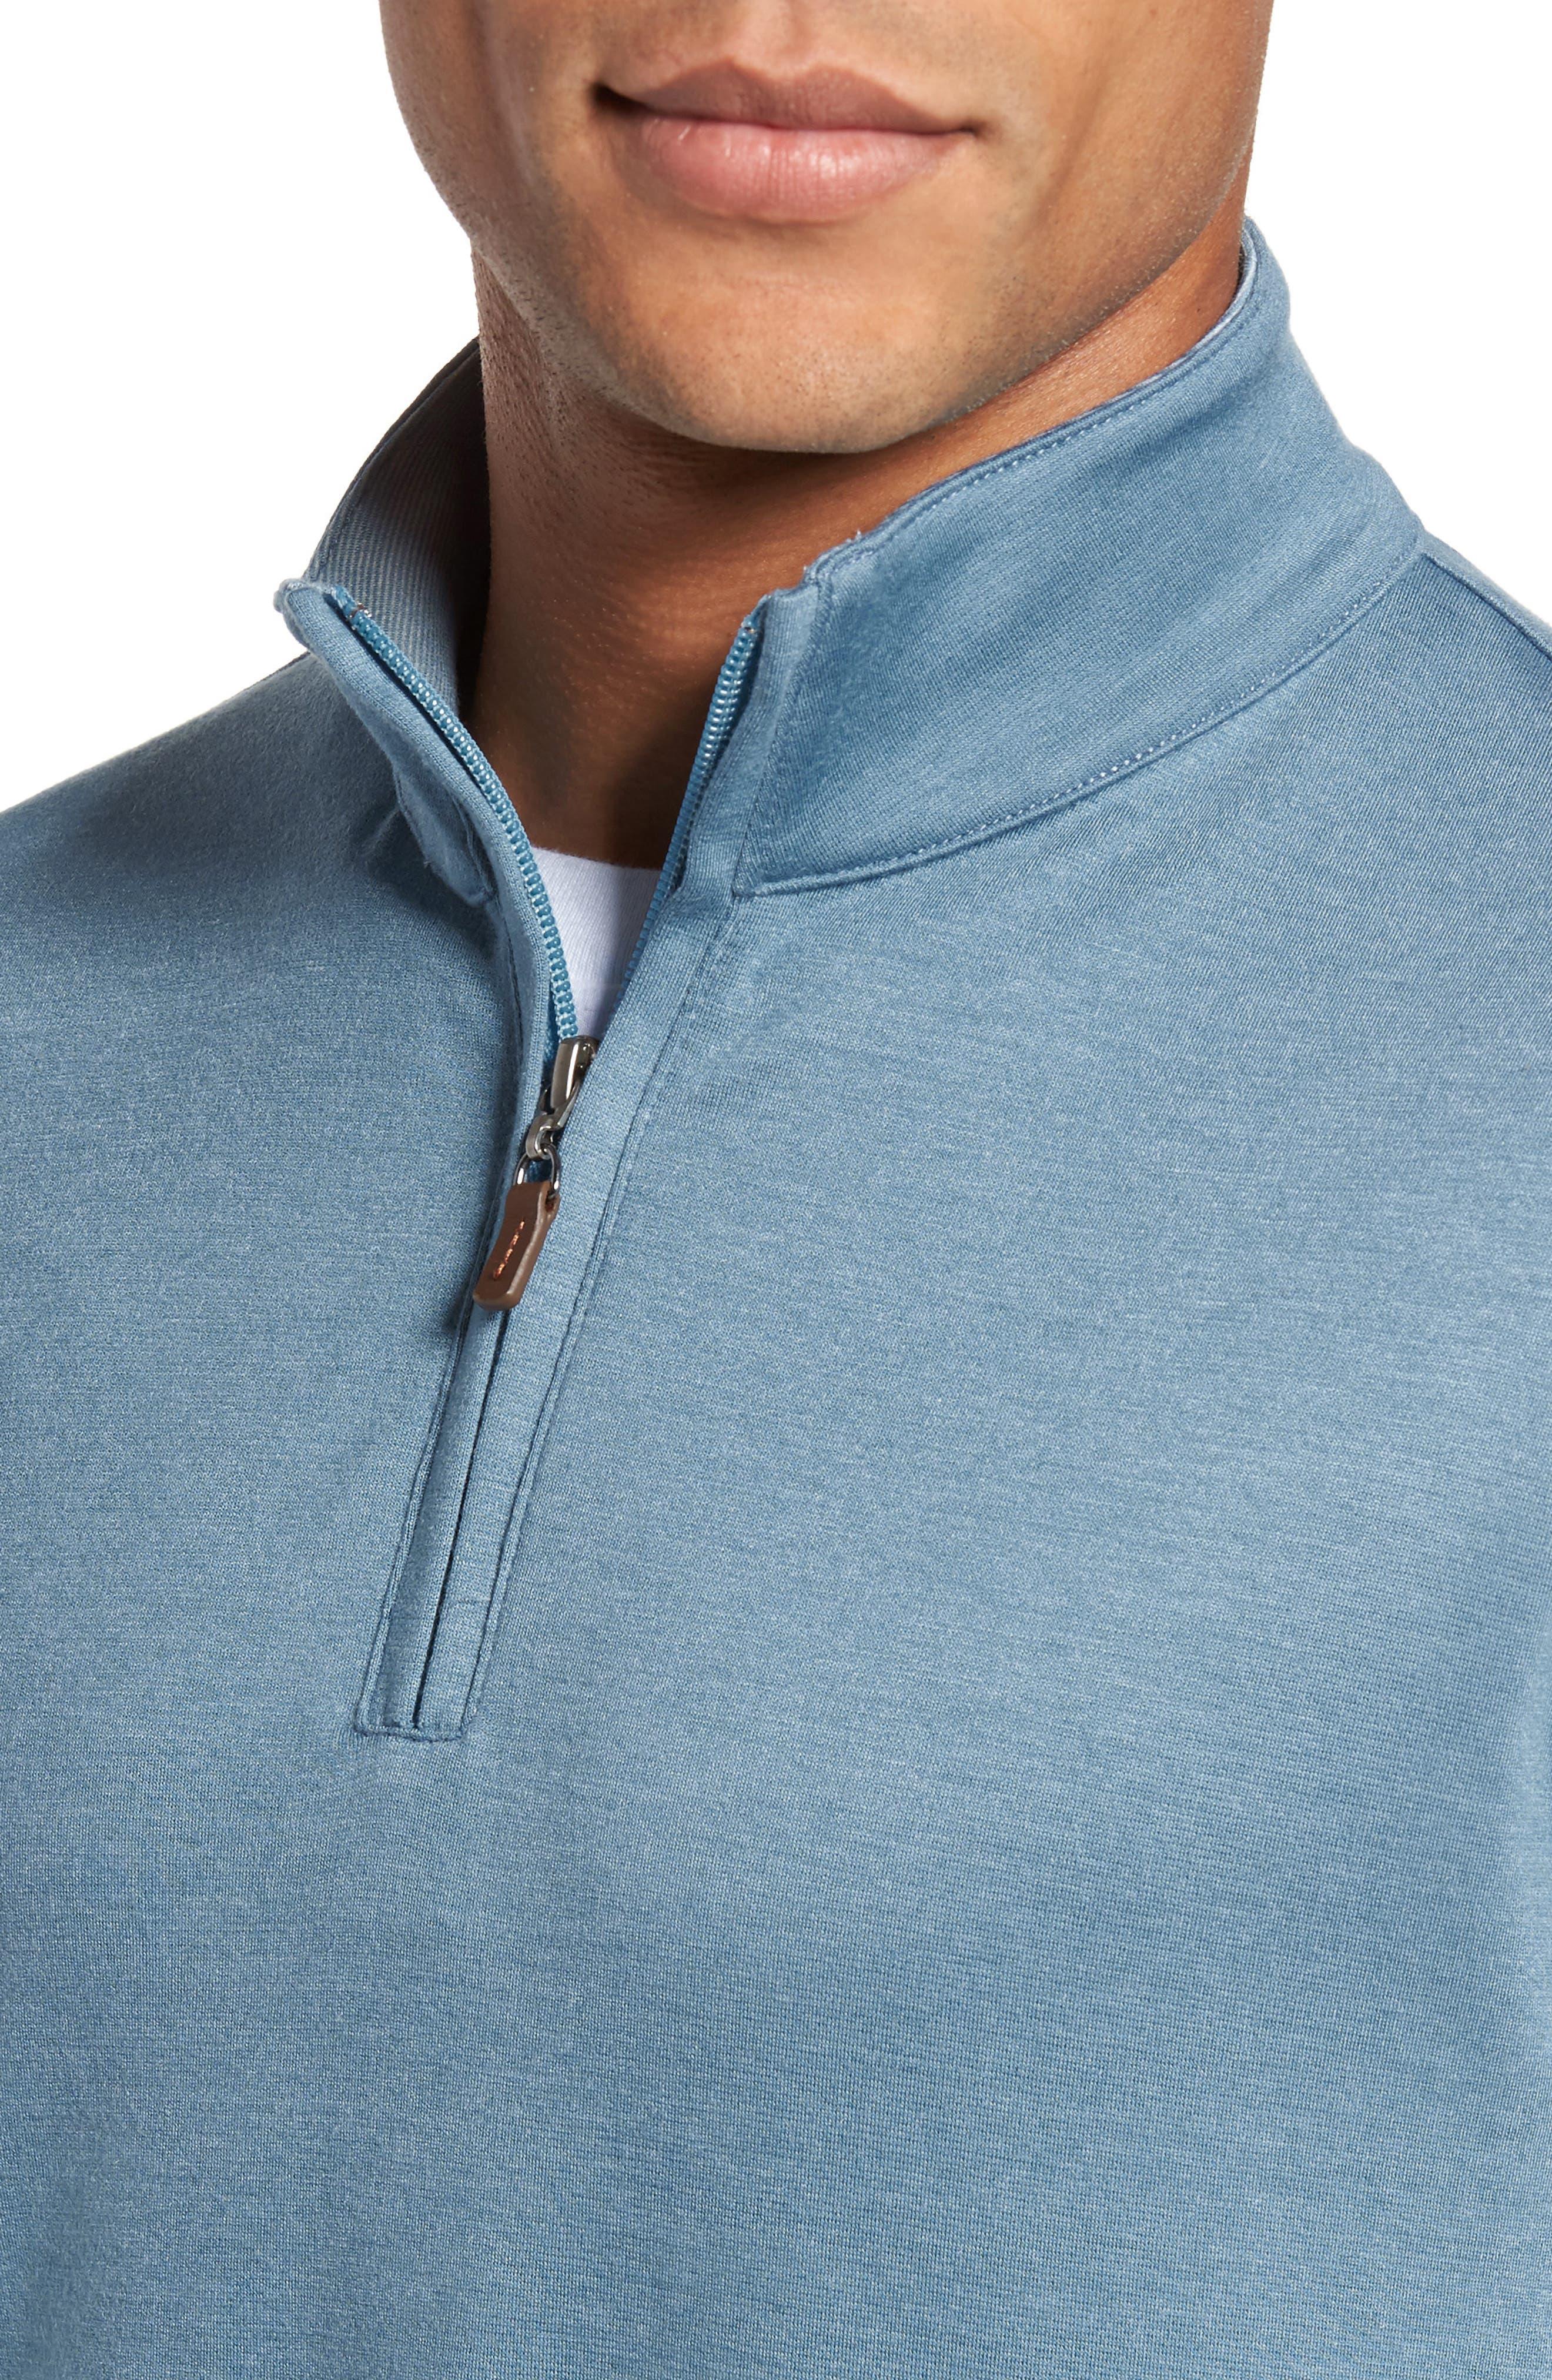 Quarter Zip Pullover,                             Alternate thumbnail 4, color,                             BLUE